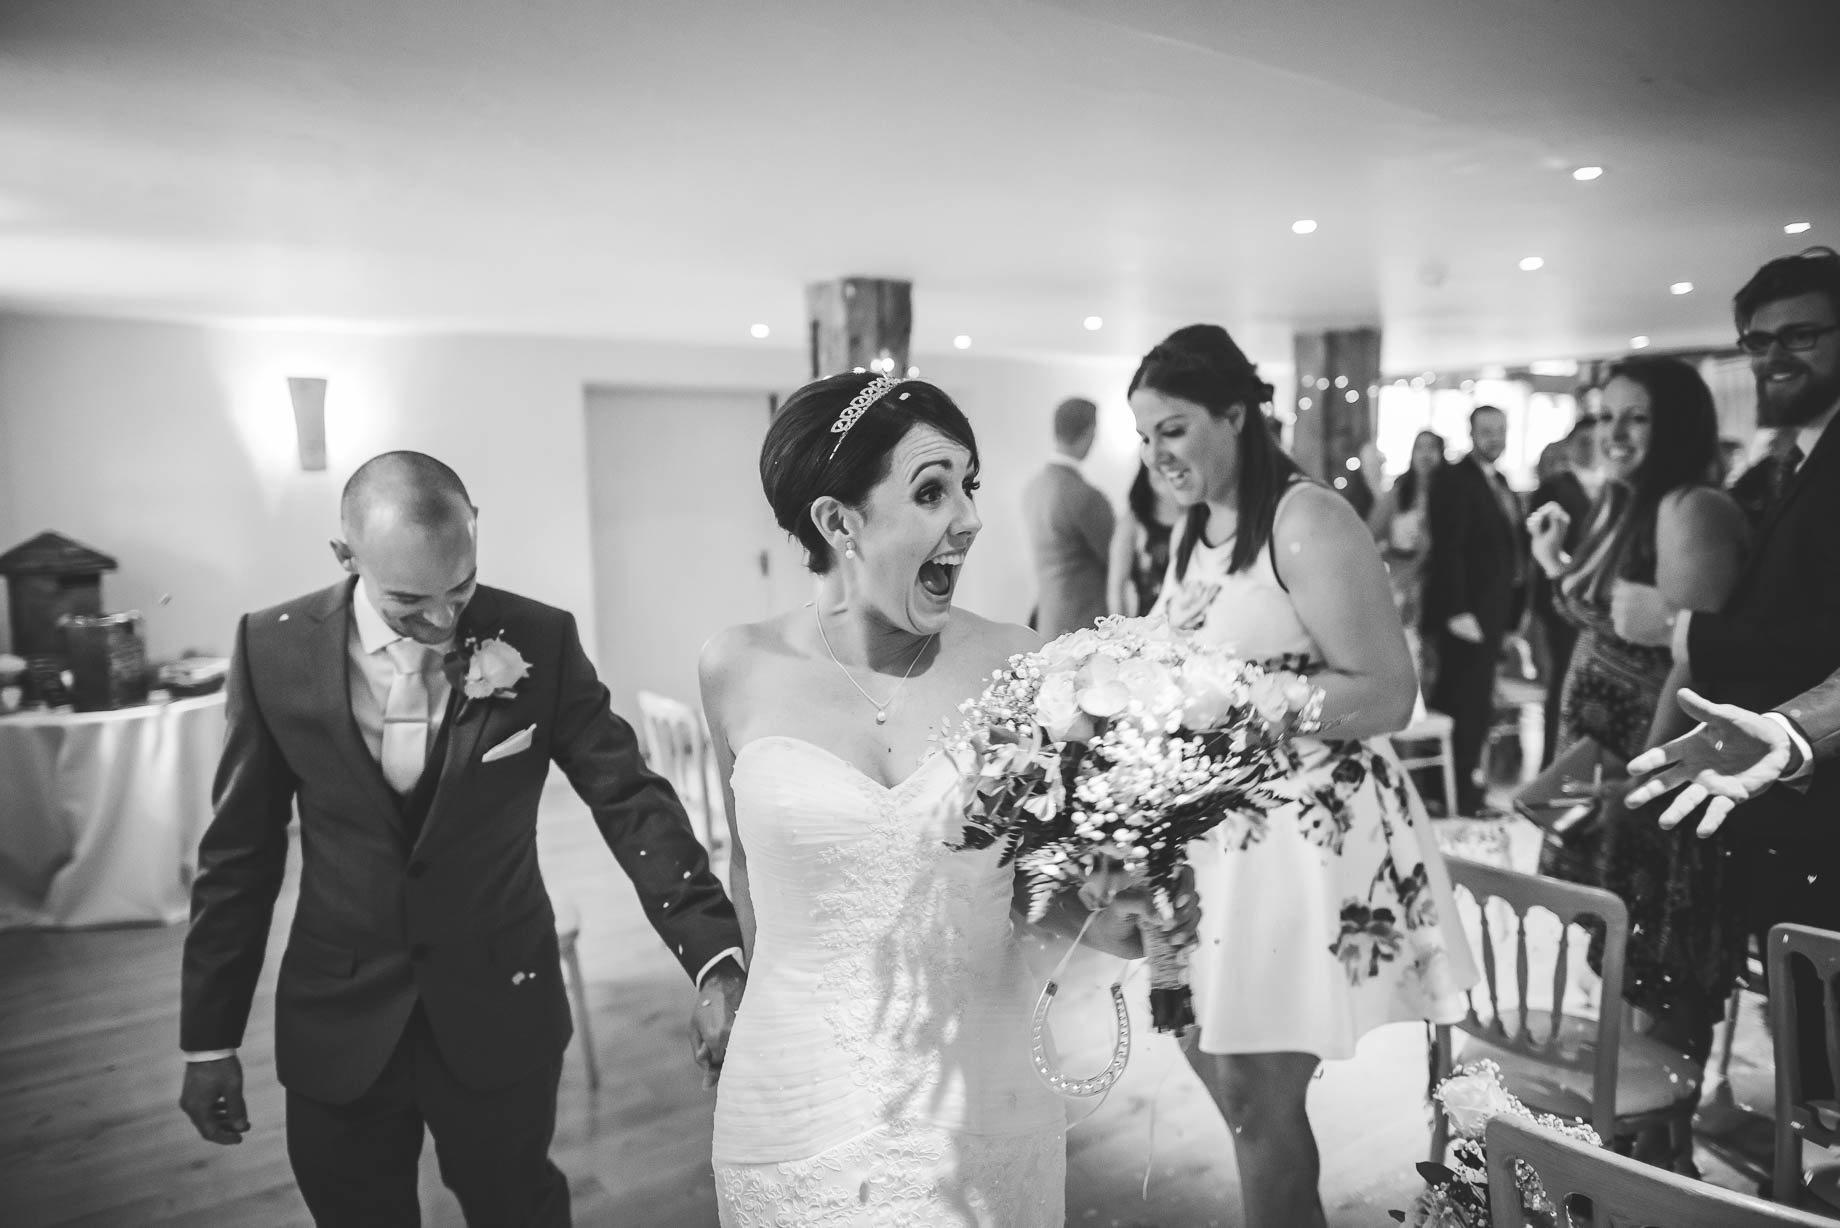 Bury-Court-Barn-wedding-photography-Guy-Collier-Photography-Karen-and-John-64-of-166